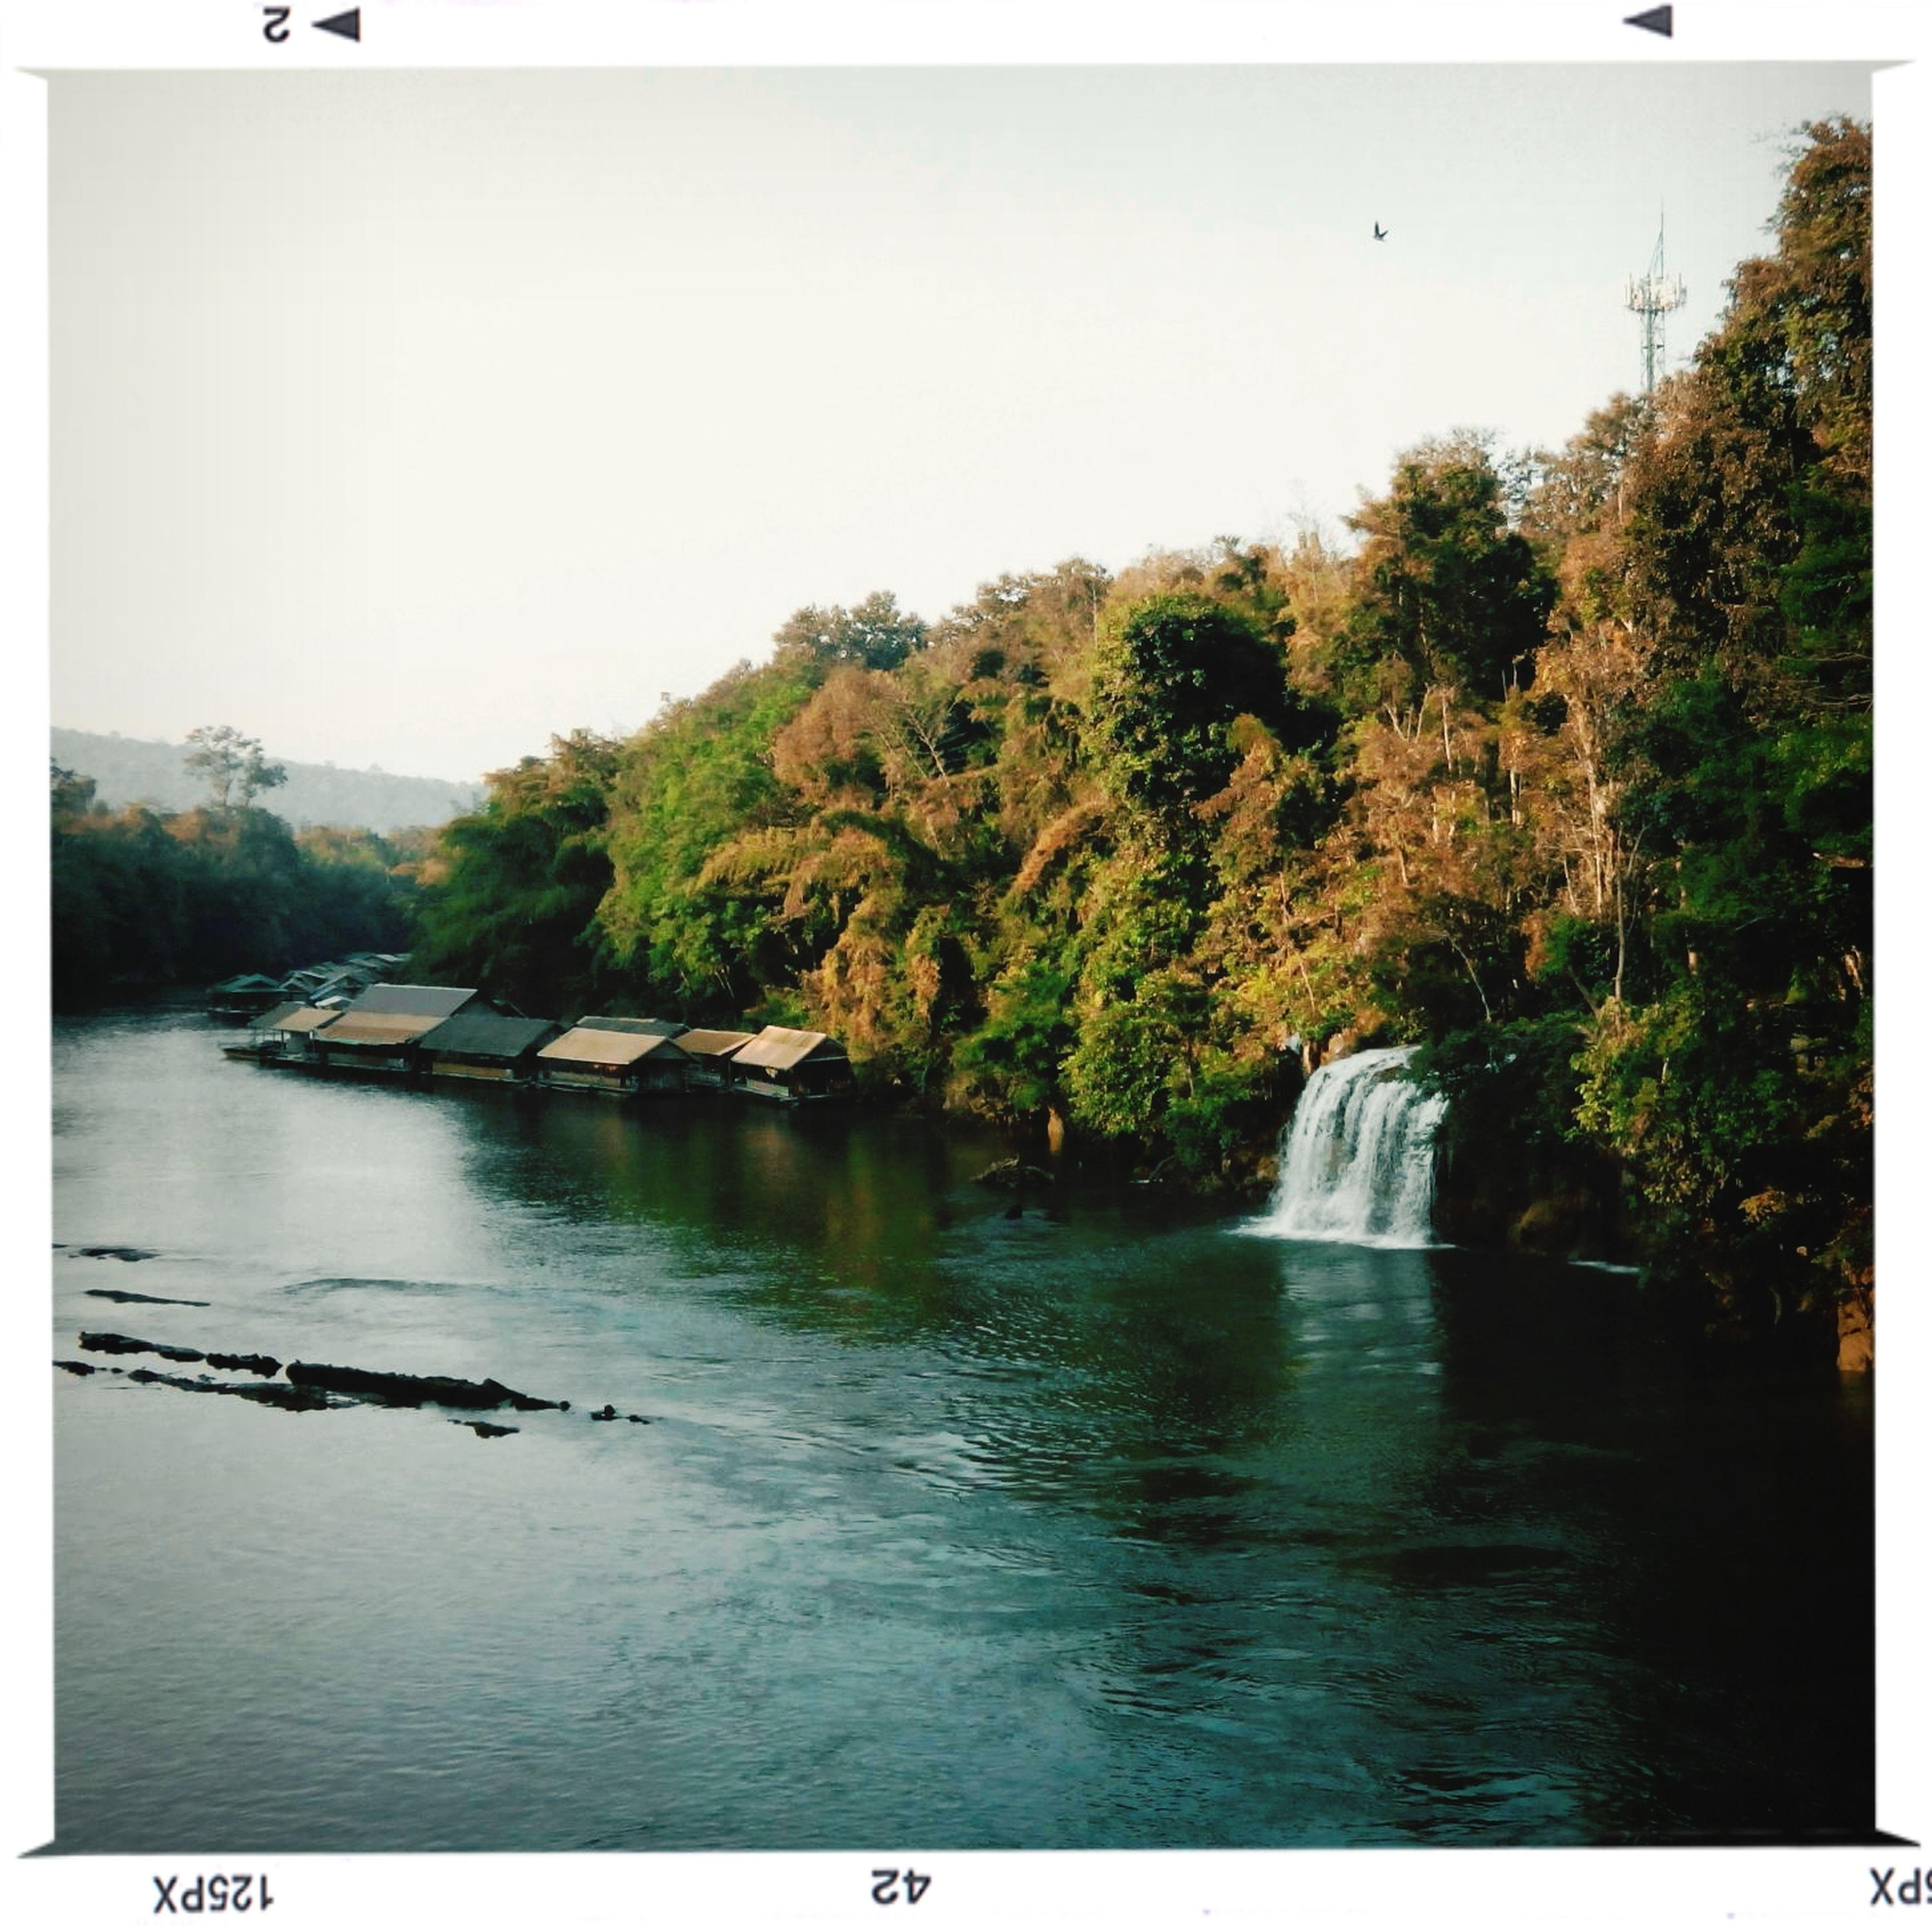 Good time @ Kanjanaburi Relaxing Nature Trip Photo